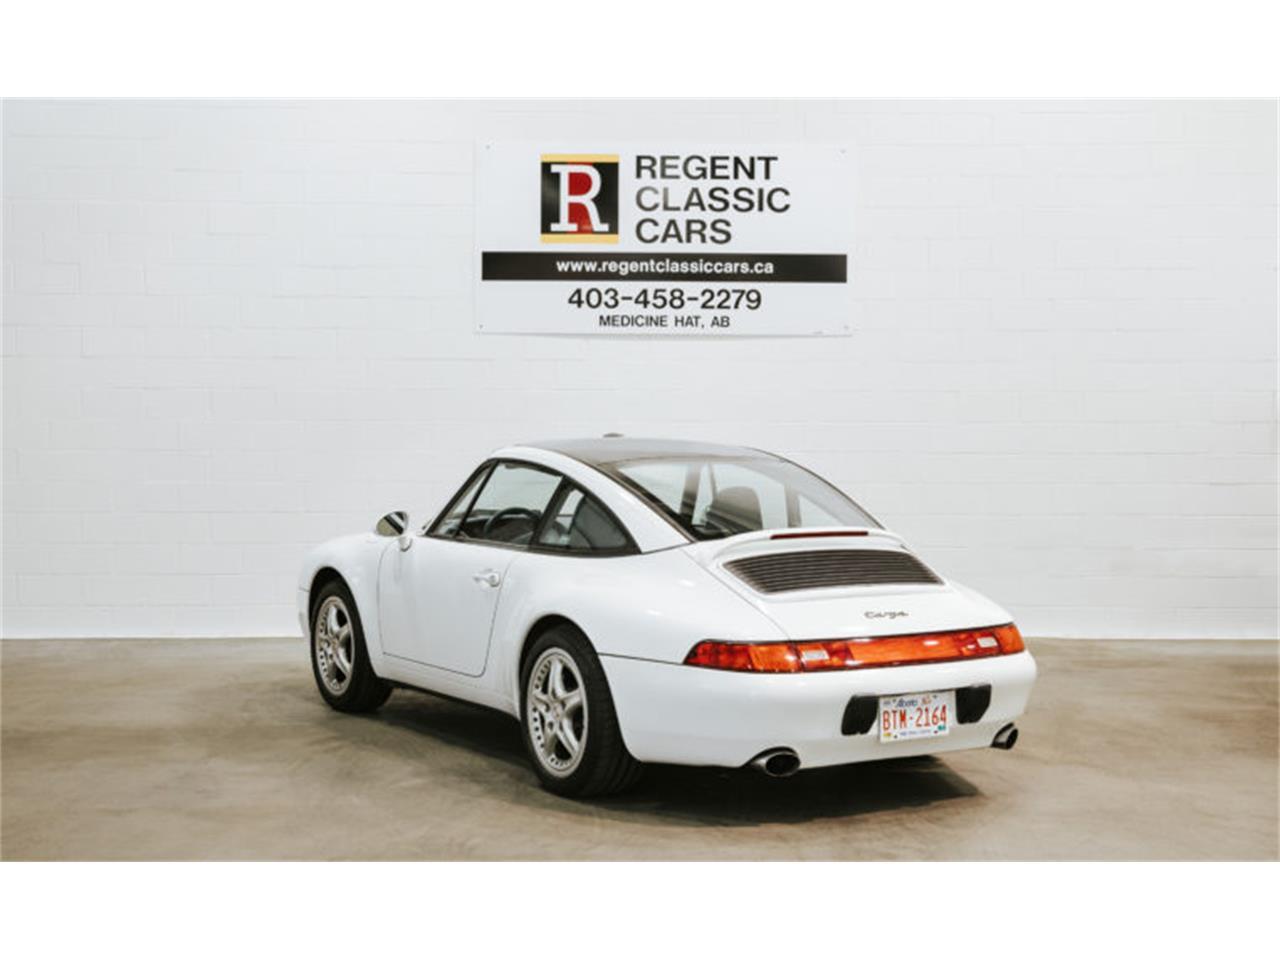 1997 Porsche 911 Targa (CC-1258415) for sale in Redcliff, Alberta